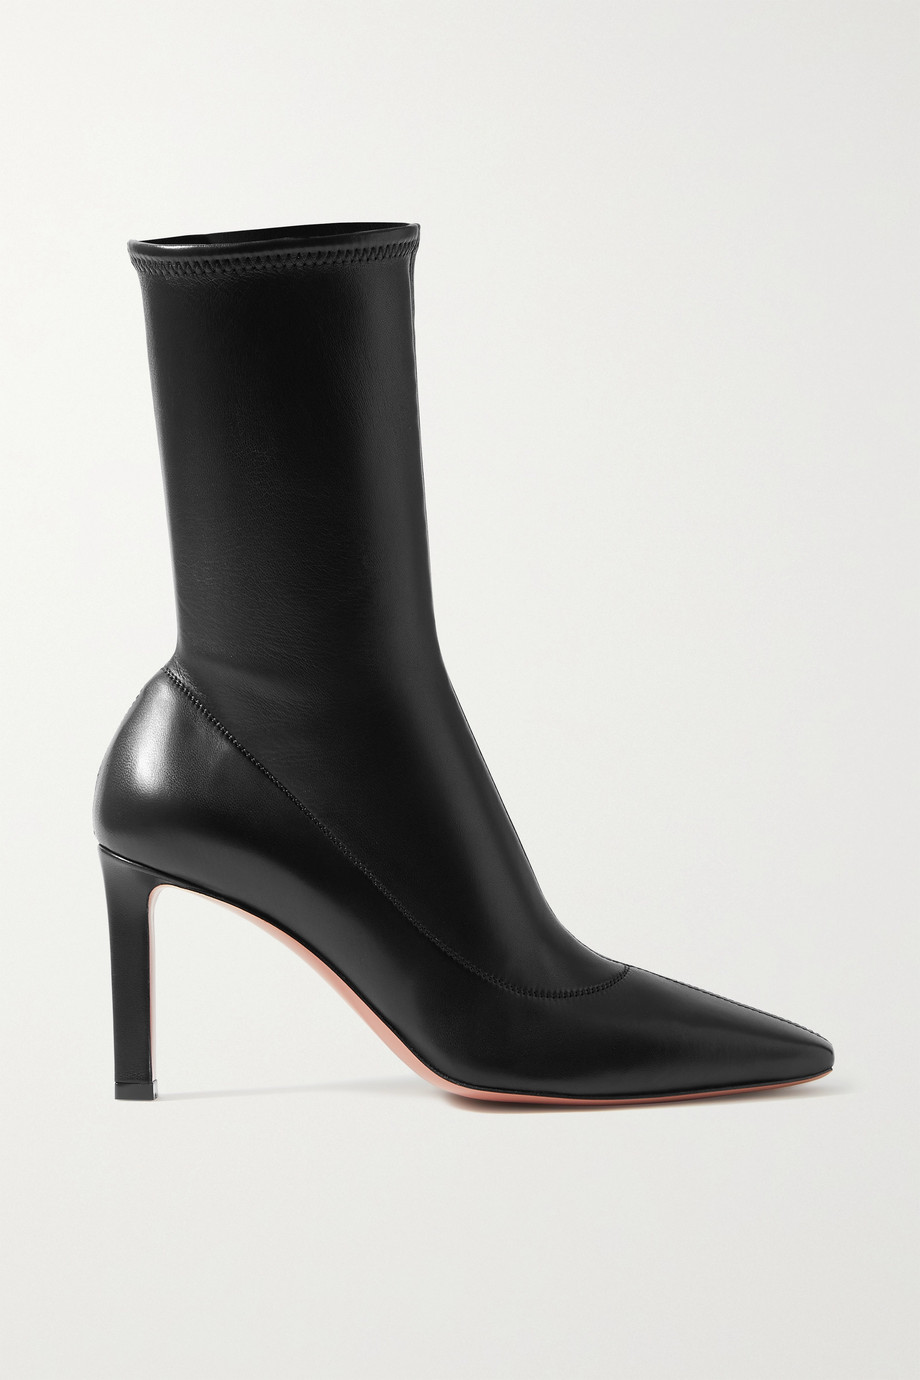 Amina Muaddi Hannah leather ankle boots